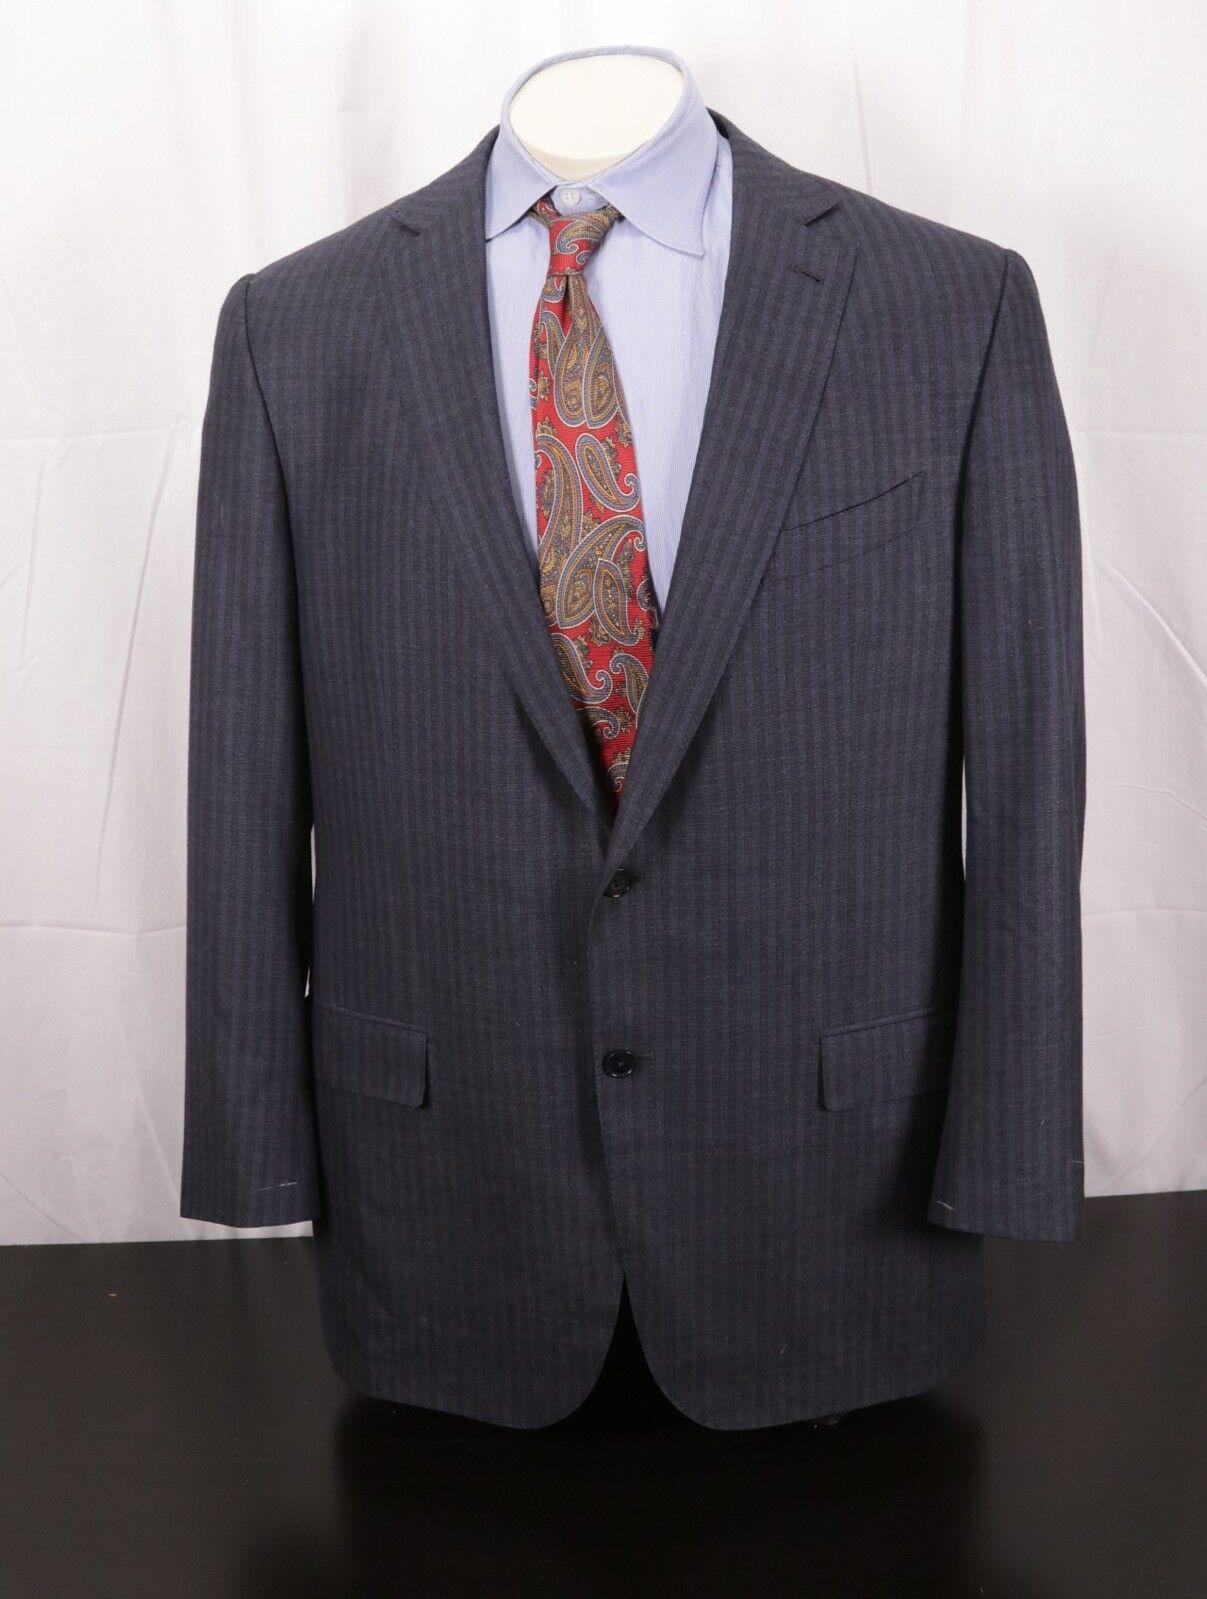 ERMENEGILDO ZEGNA Trofeo 600 Silk/Wool grau/Blau Striped Sport Coat Eu 56 US 45L